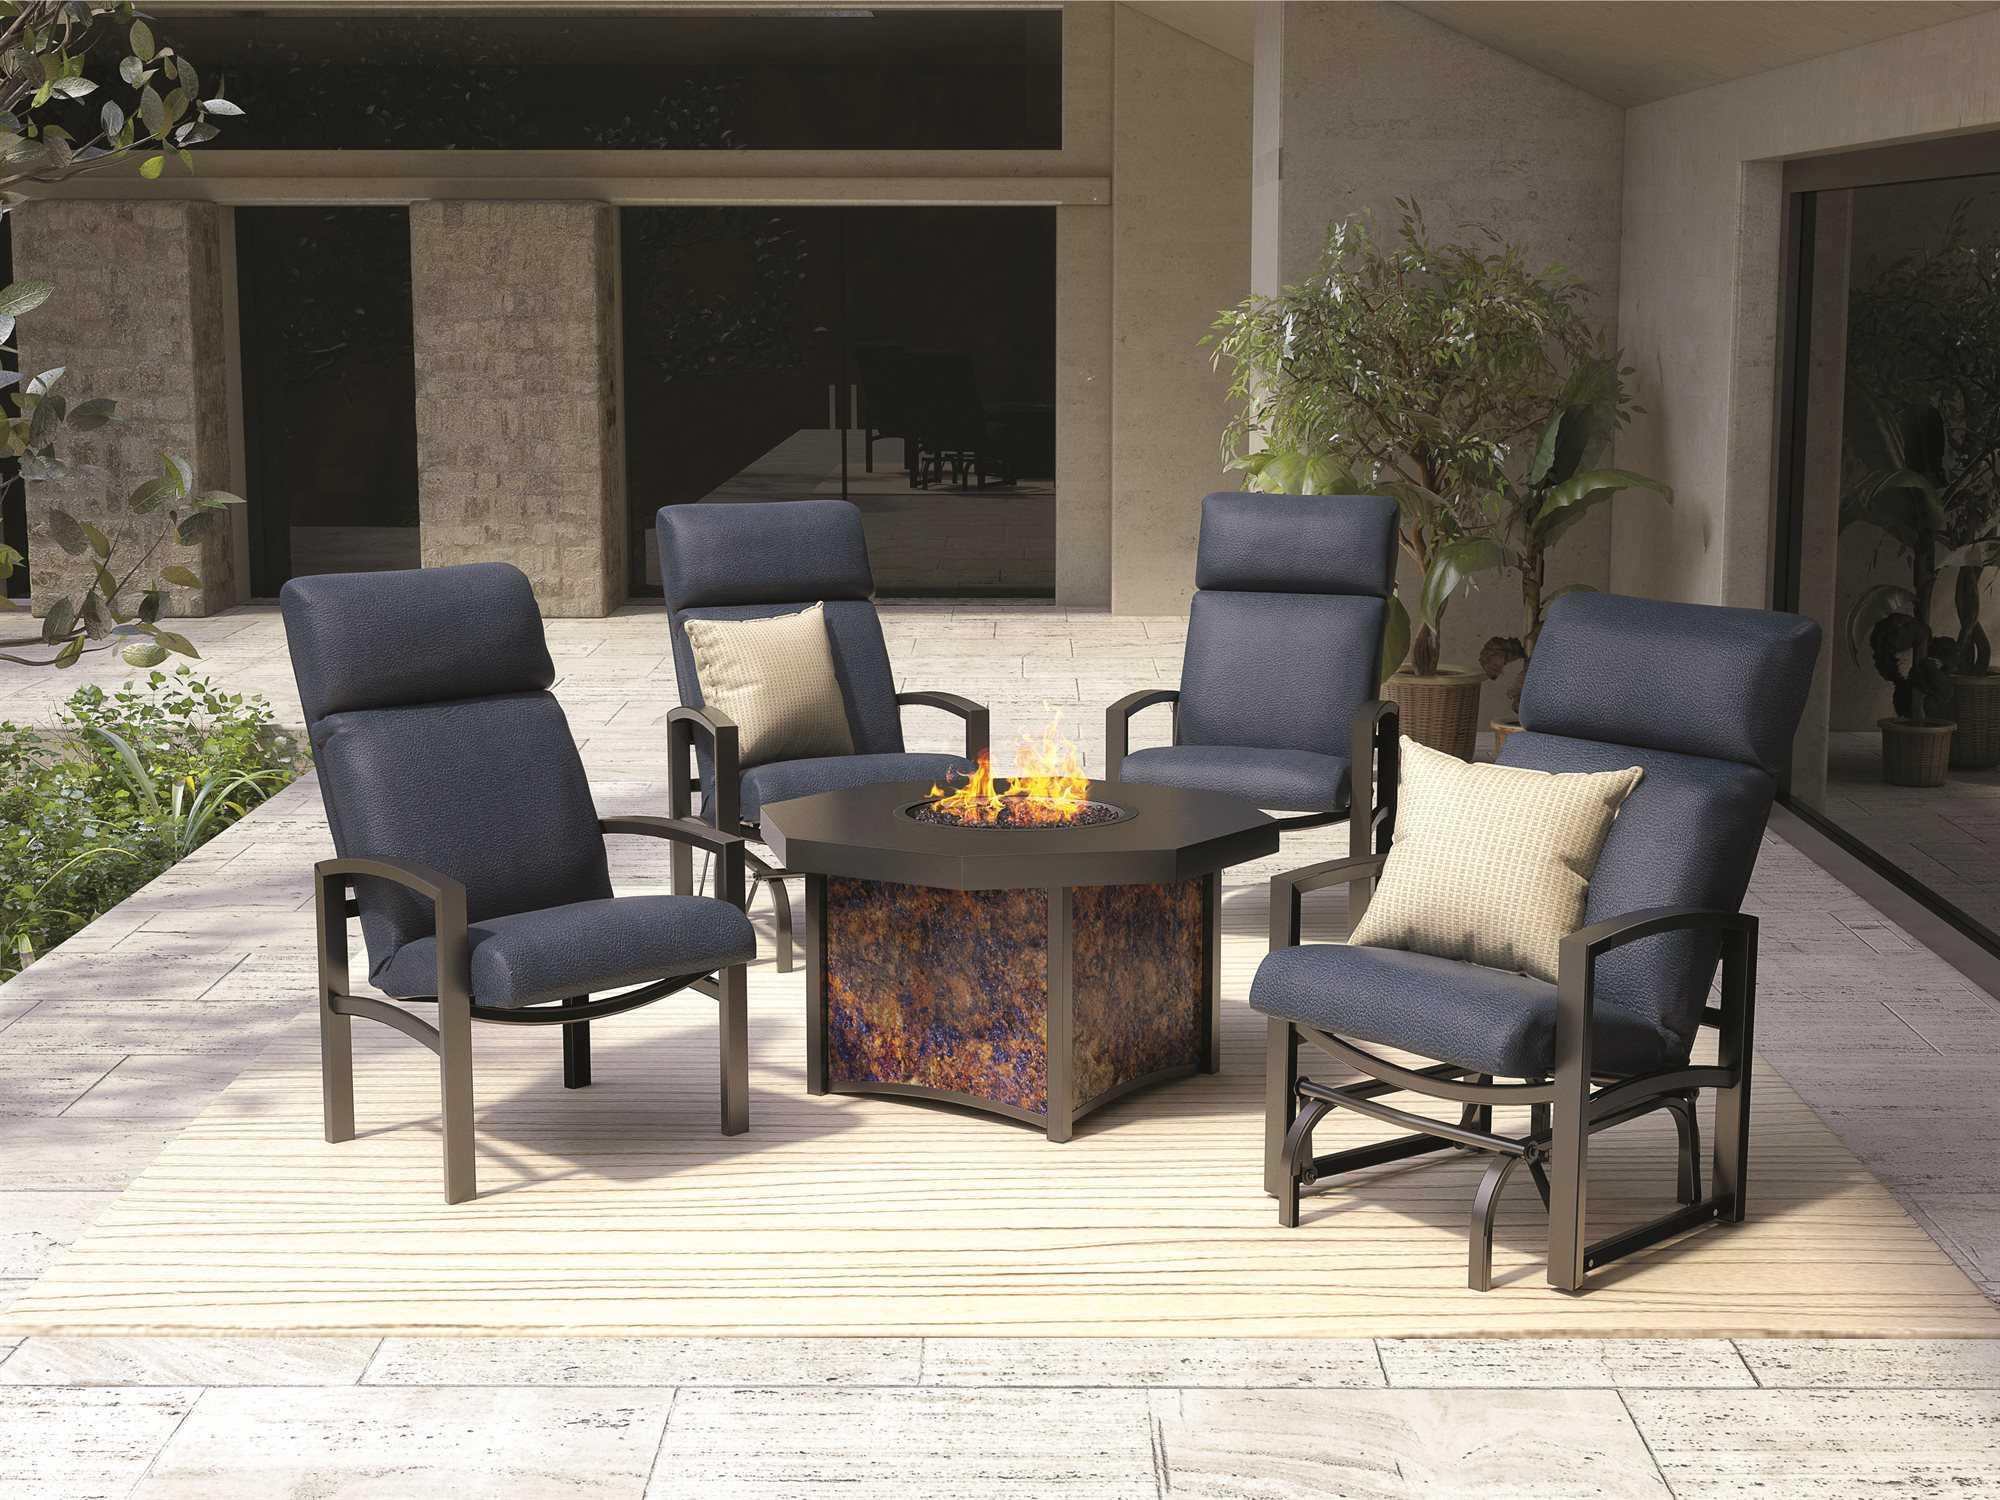 Homecrest Havenhill Cushion Aluminum High Back Dining Chair 4A47F